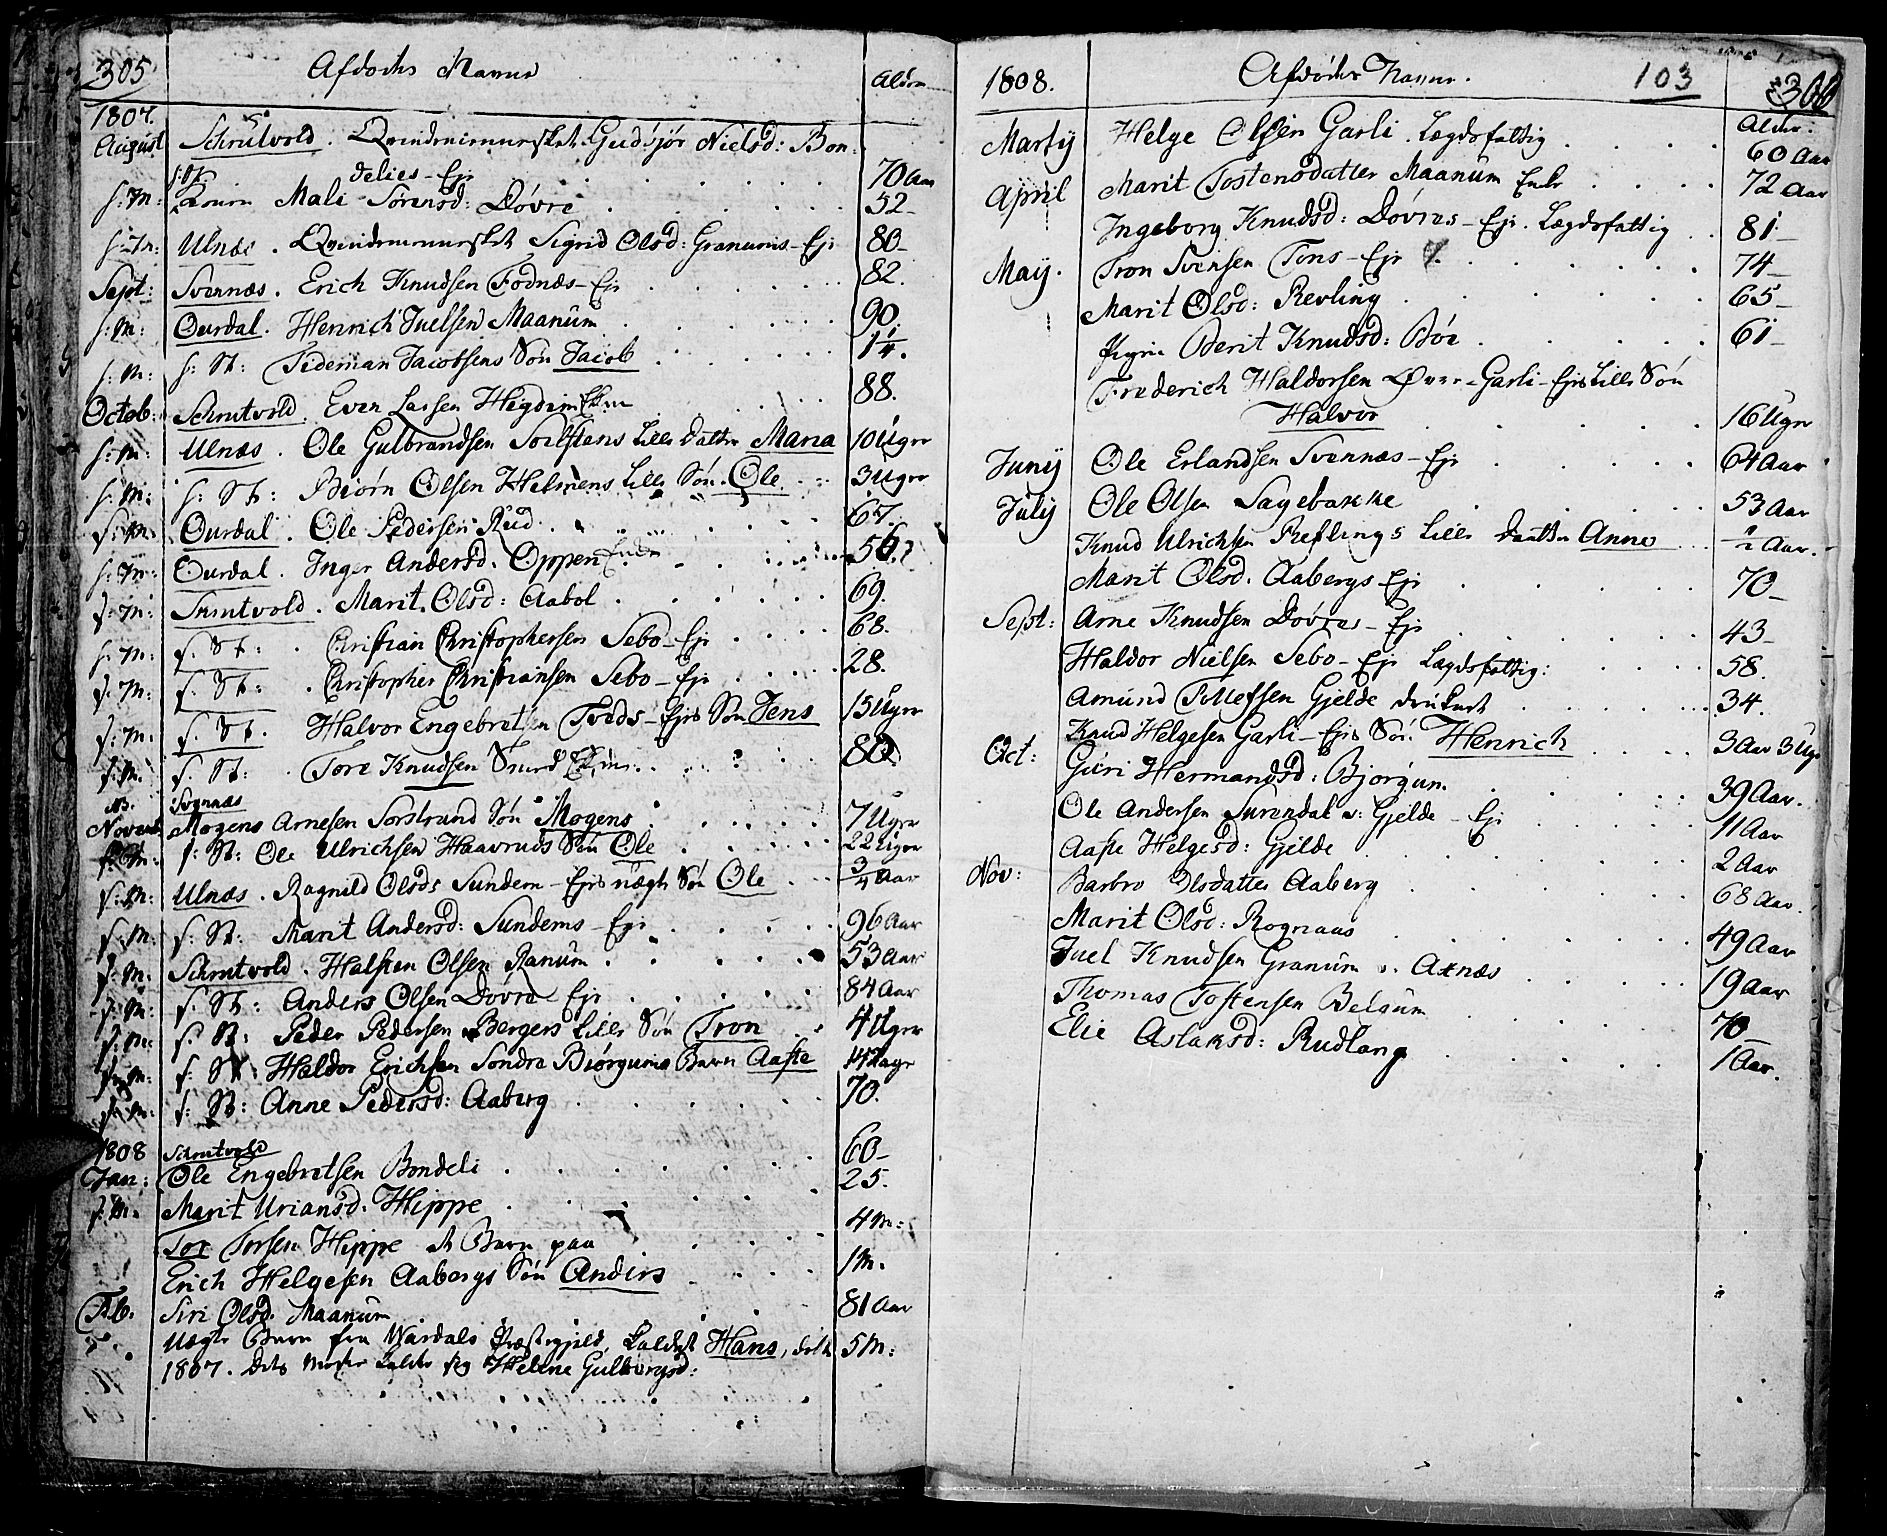 SAH, Aurdal prestekontor, Ministerialbok nr. 7, 1800-1808, s. 103